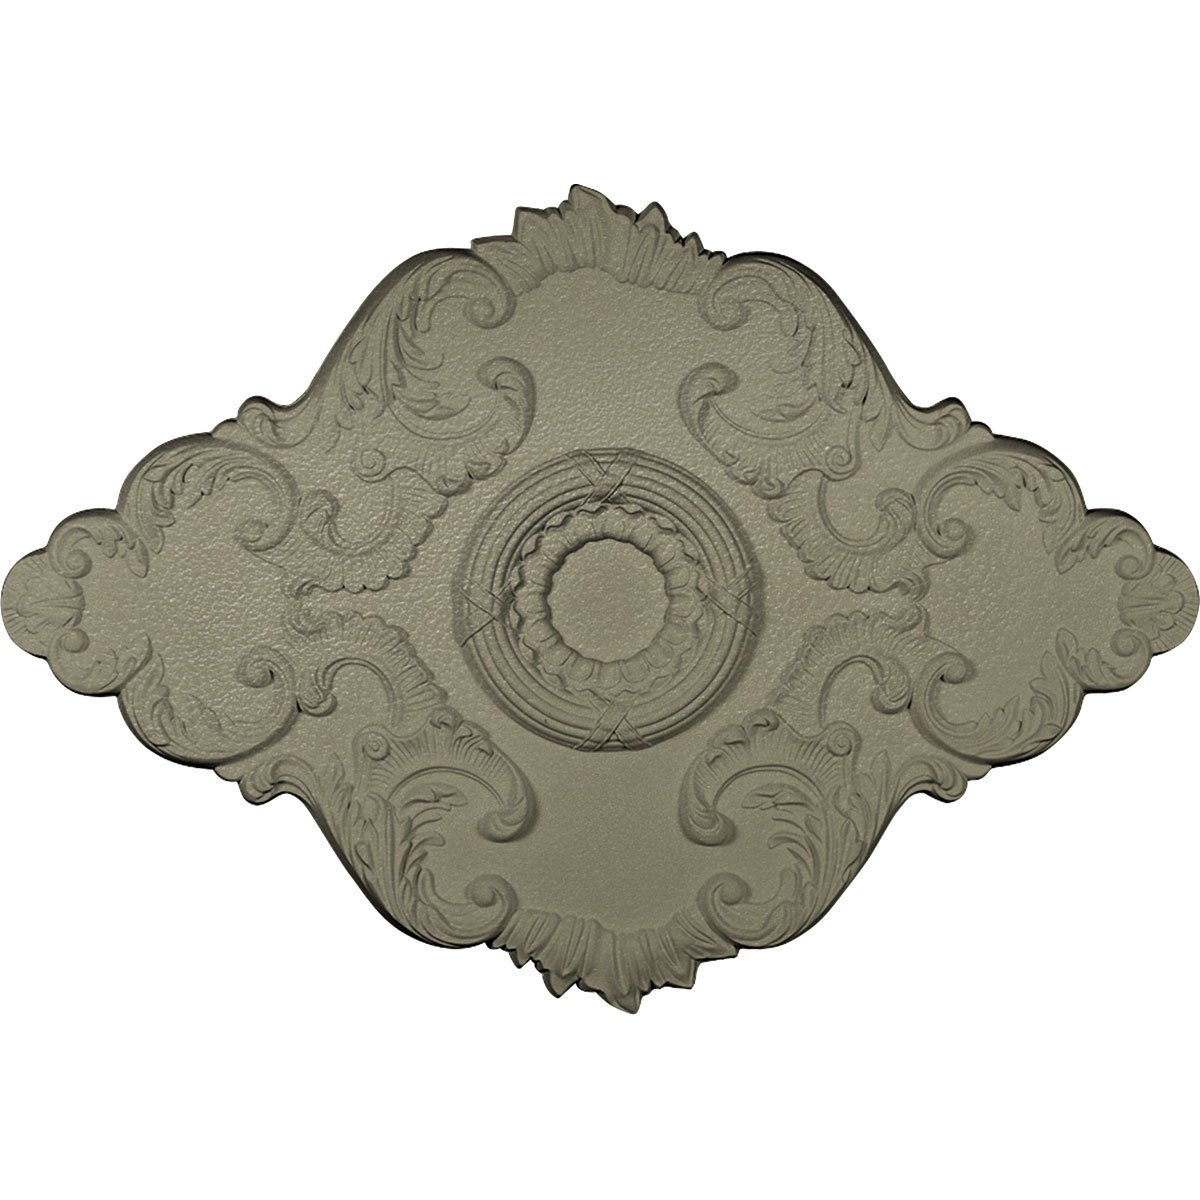 Ekena Millwork CM36X26PESSF 36'' W x 26'' H x 1 1/2'' P Pesaro Ceiling Medallion, Hand-Painted, Spartan Stone